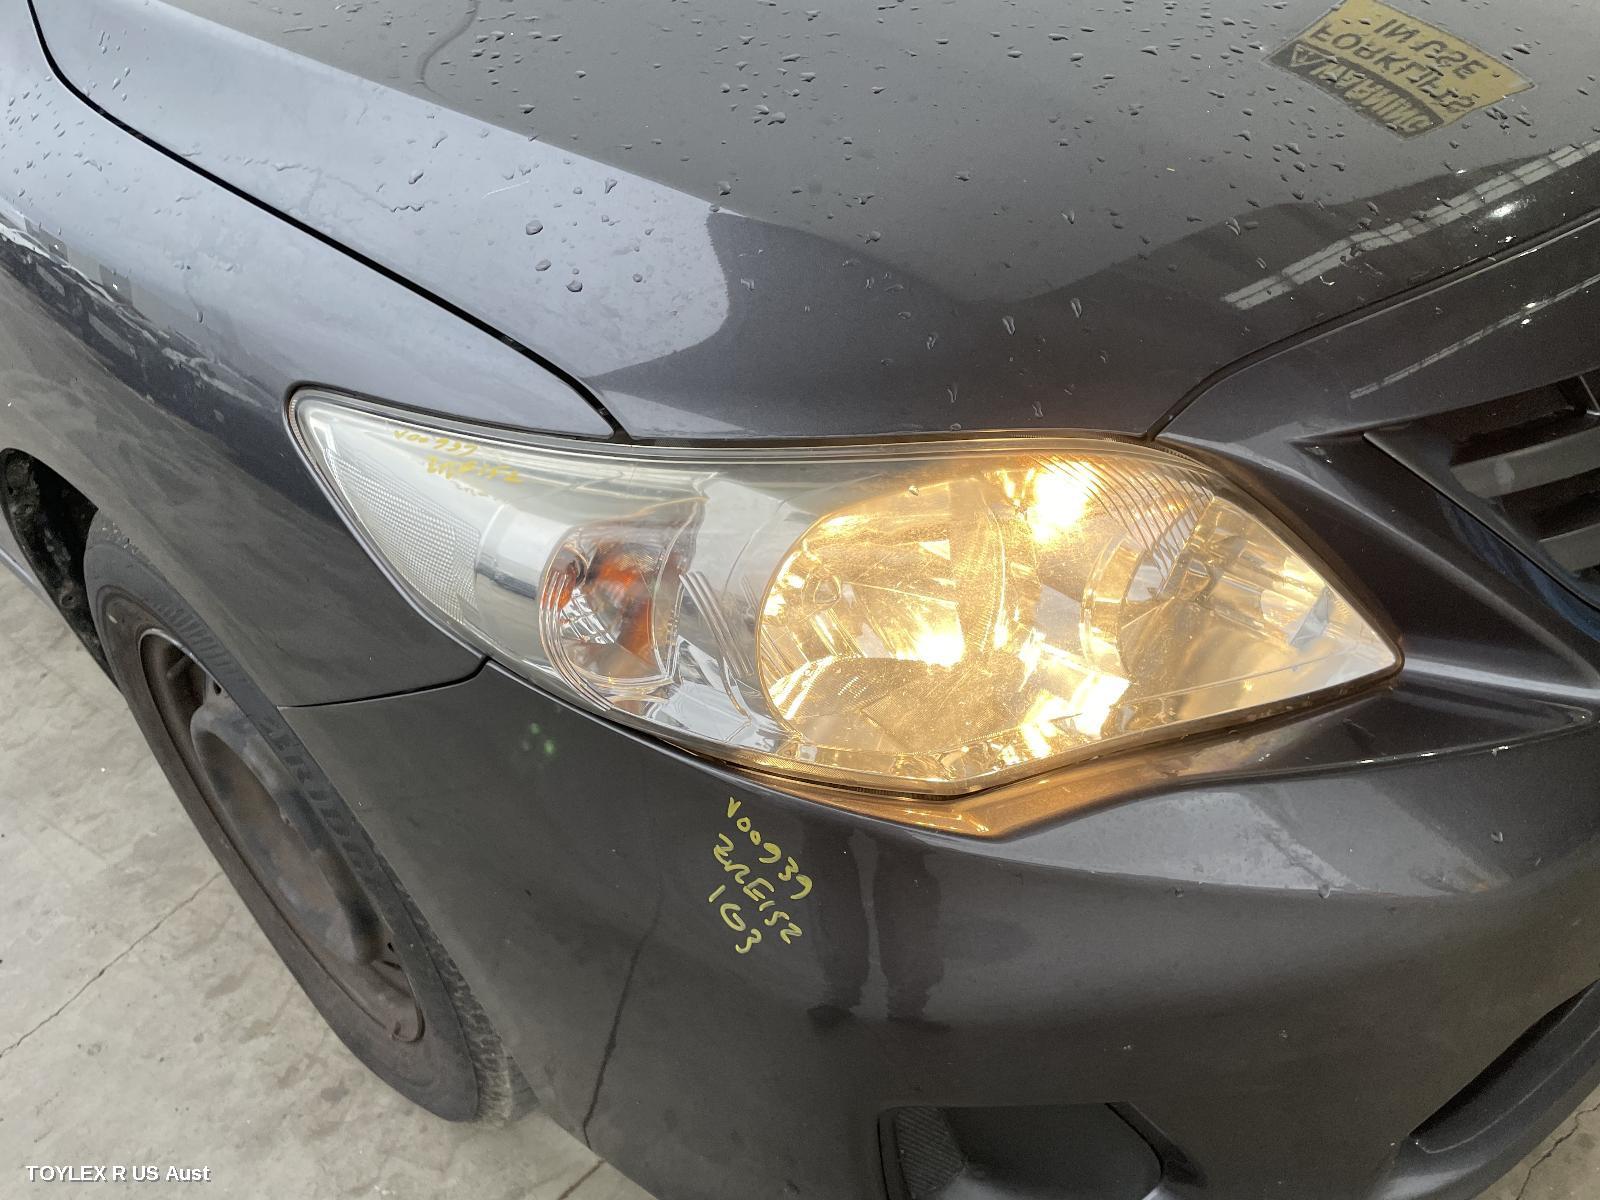 TOYOTA COROLLA, Right Headlamp, ZRE152/153R, SEDAN, HALOGEN TYPE, 11/09-12/13